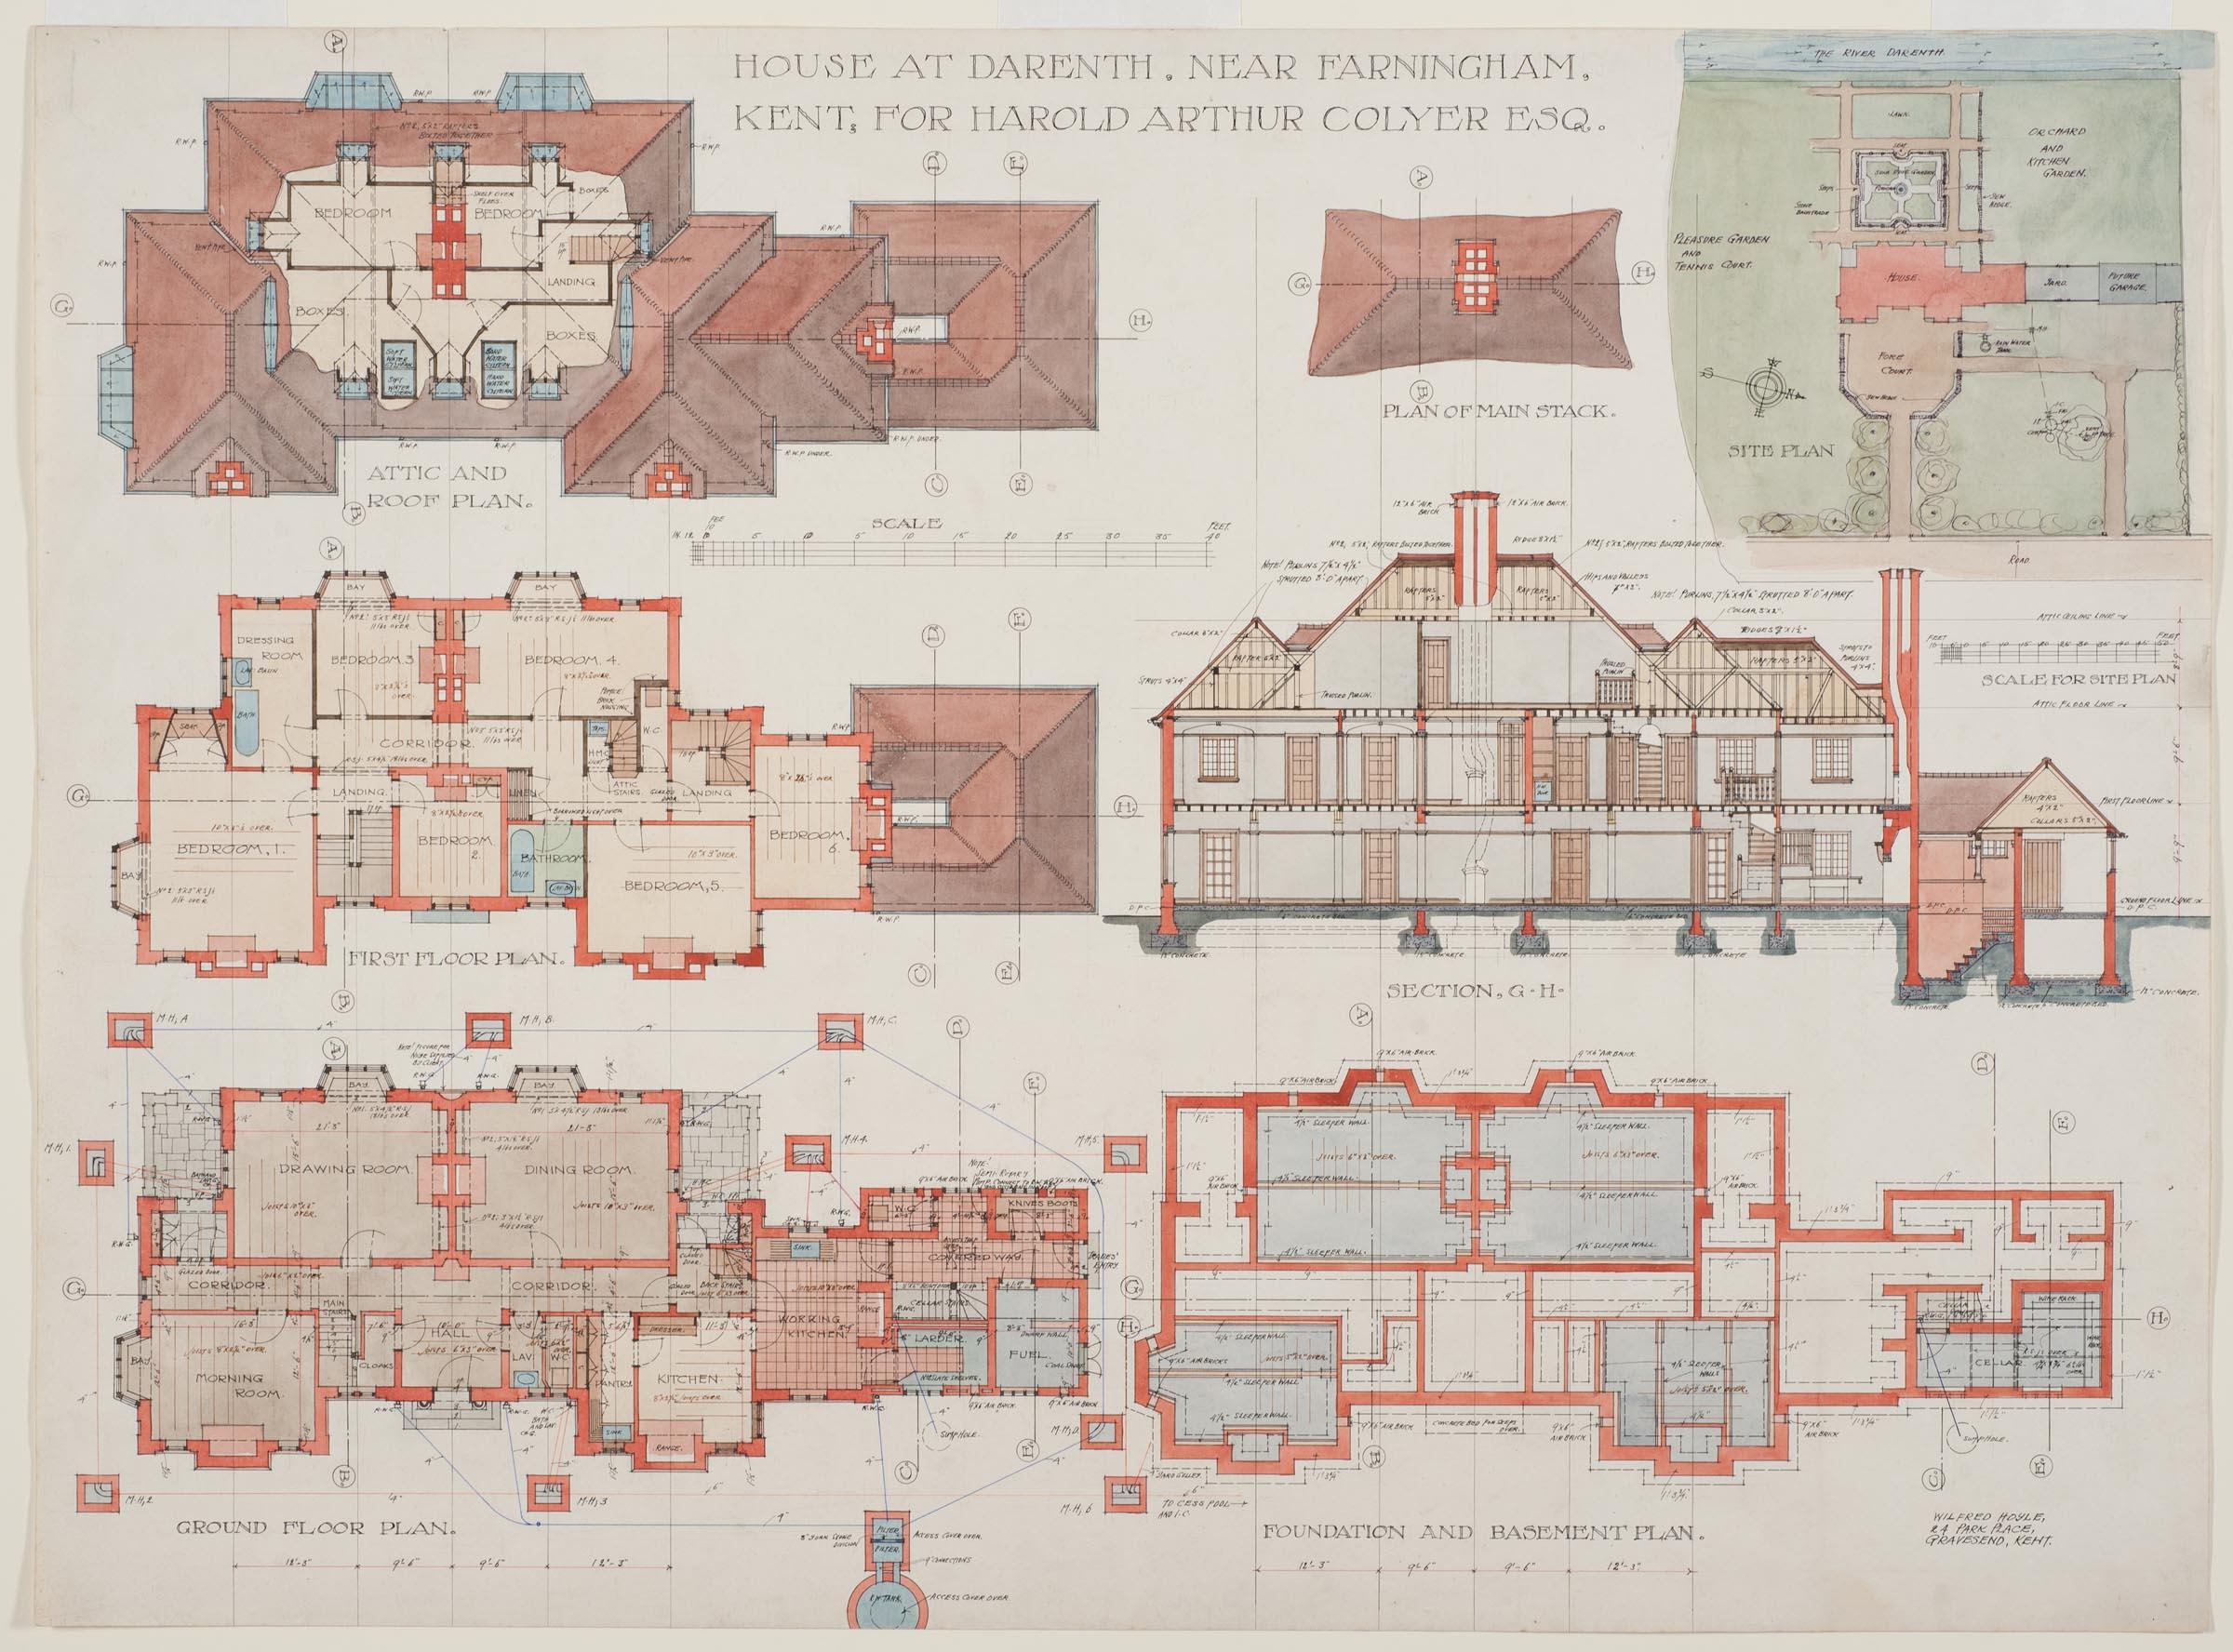 House for Harold Arthur Colyer, Darenth, England